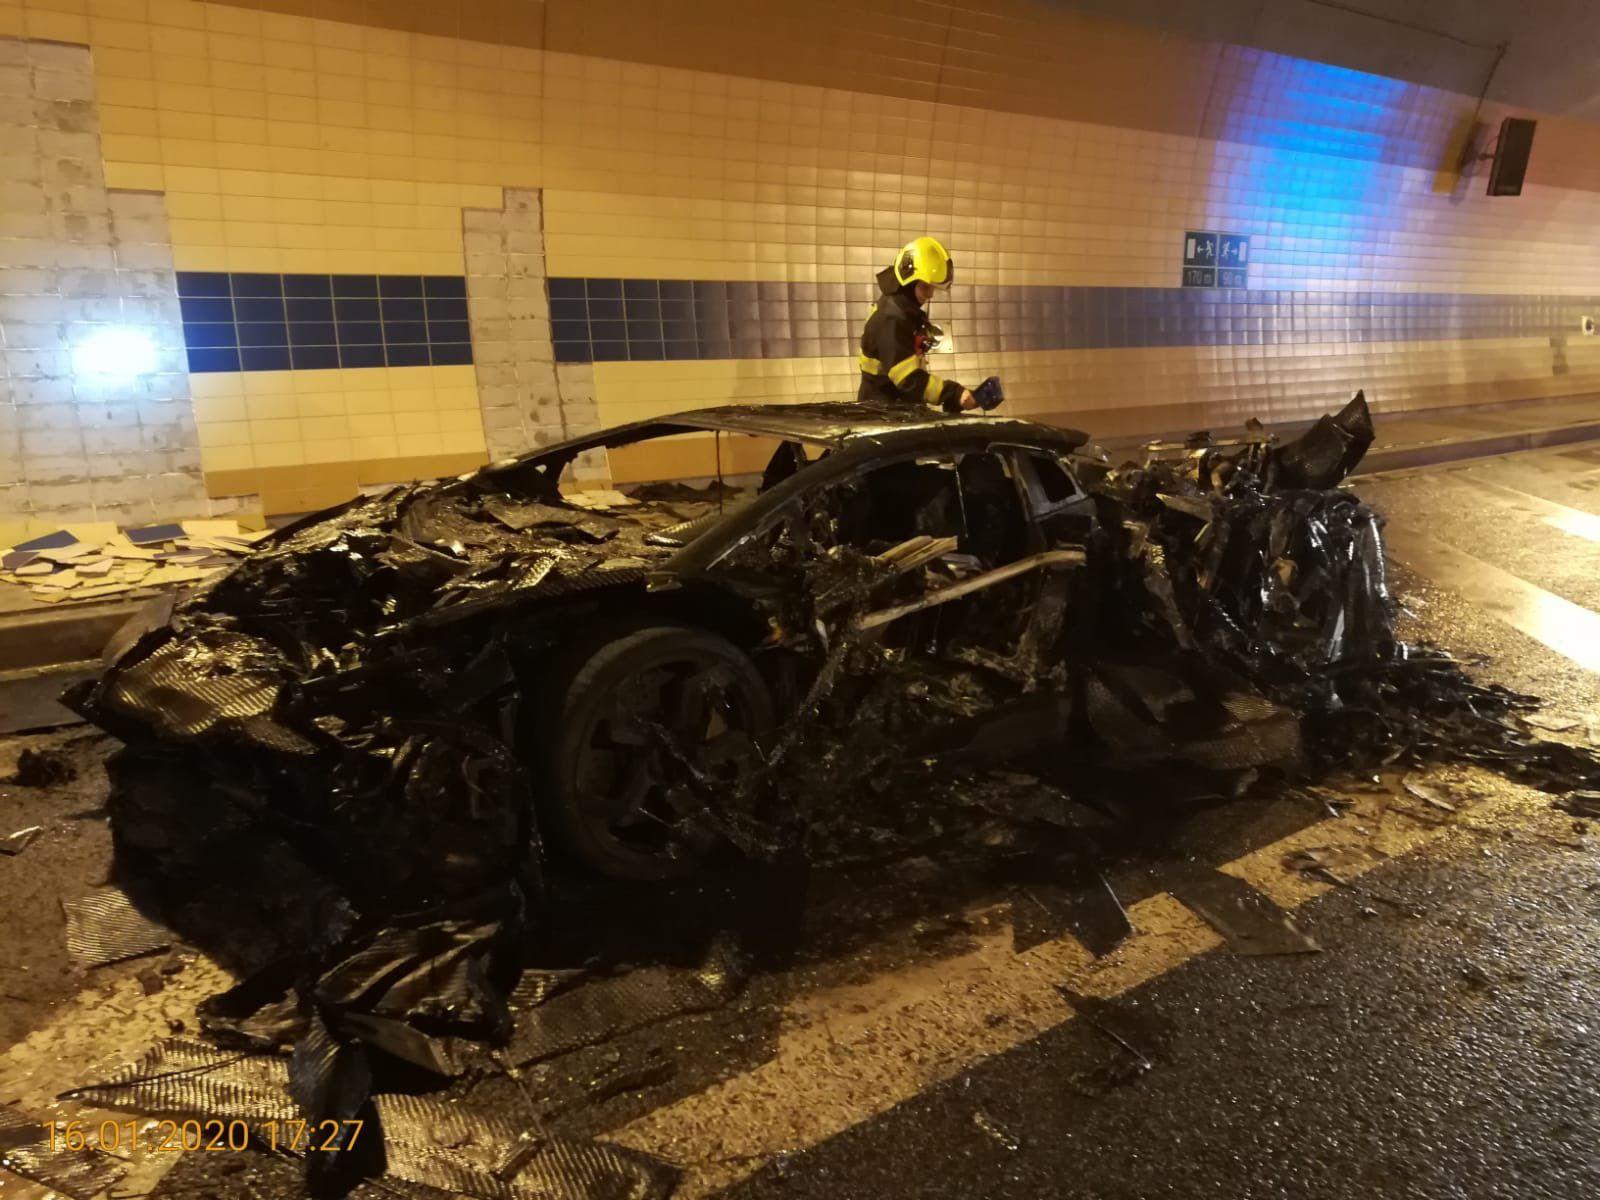 V tunelu Blanka hořelo Lamborghini, nikomu se nic nestalo